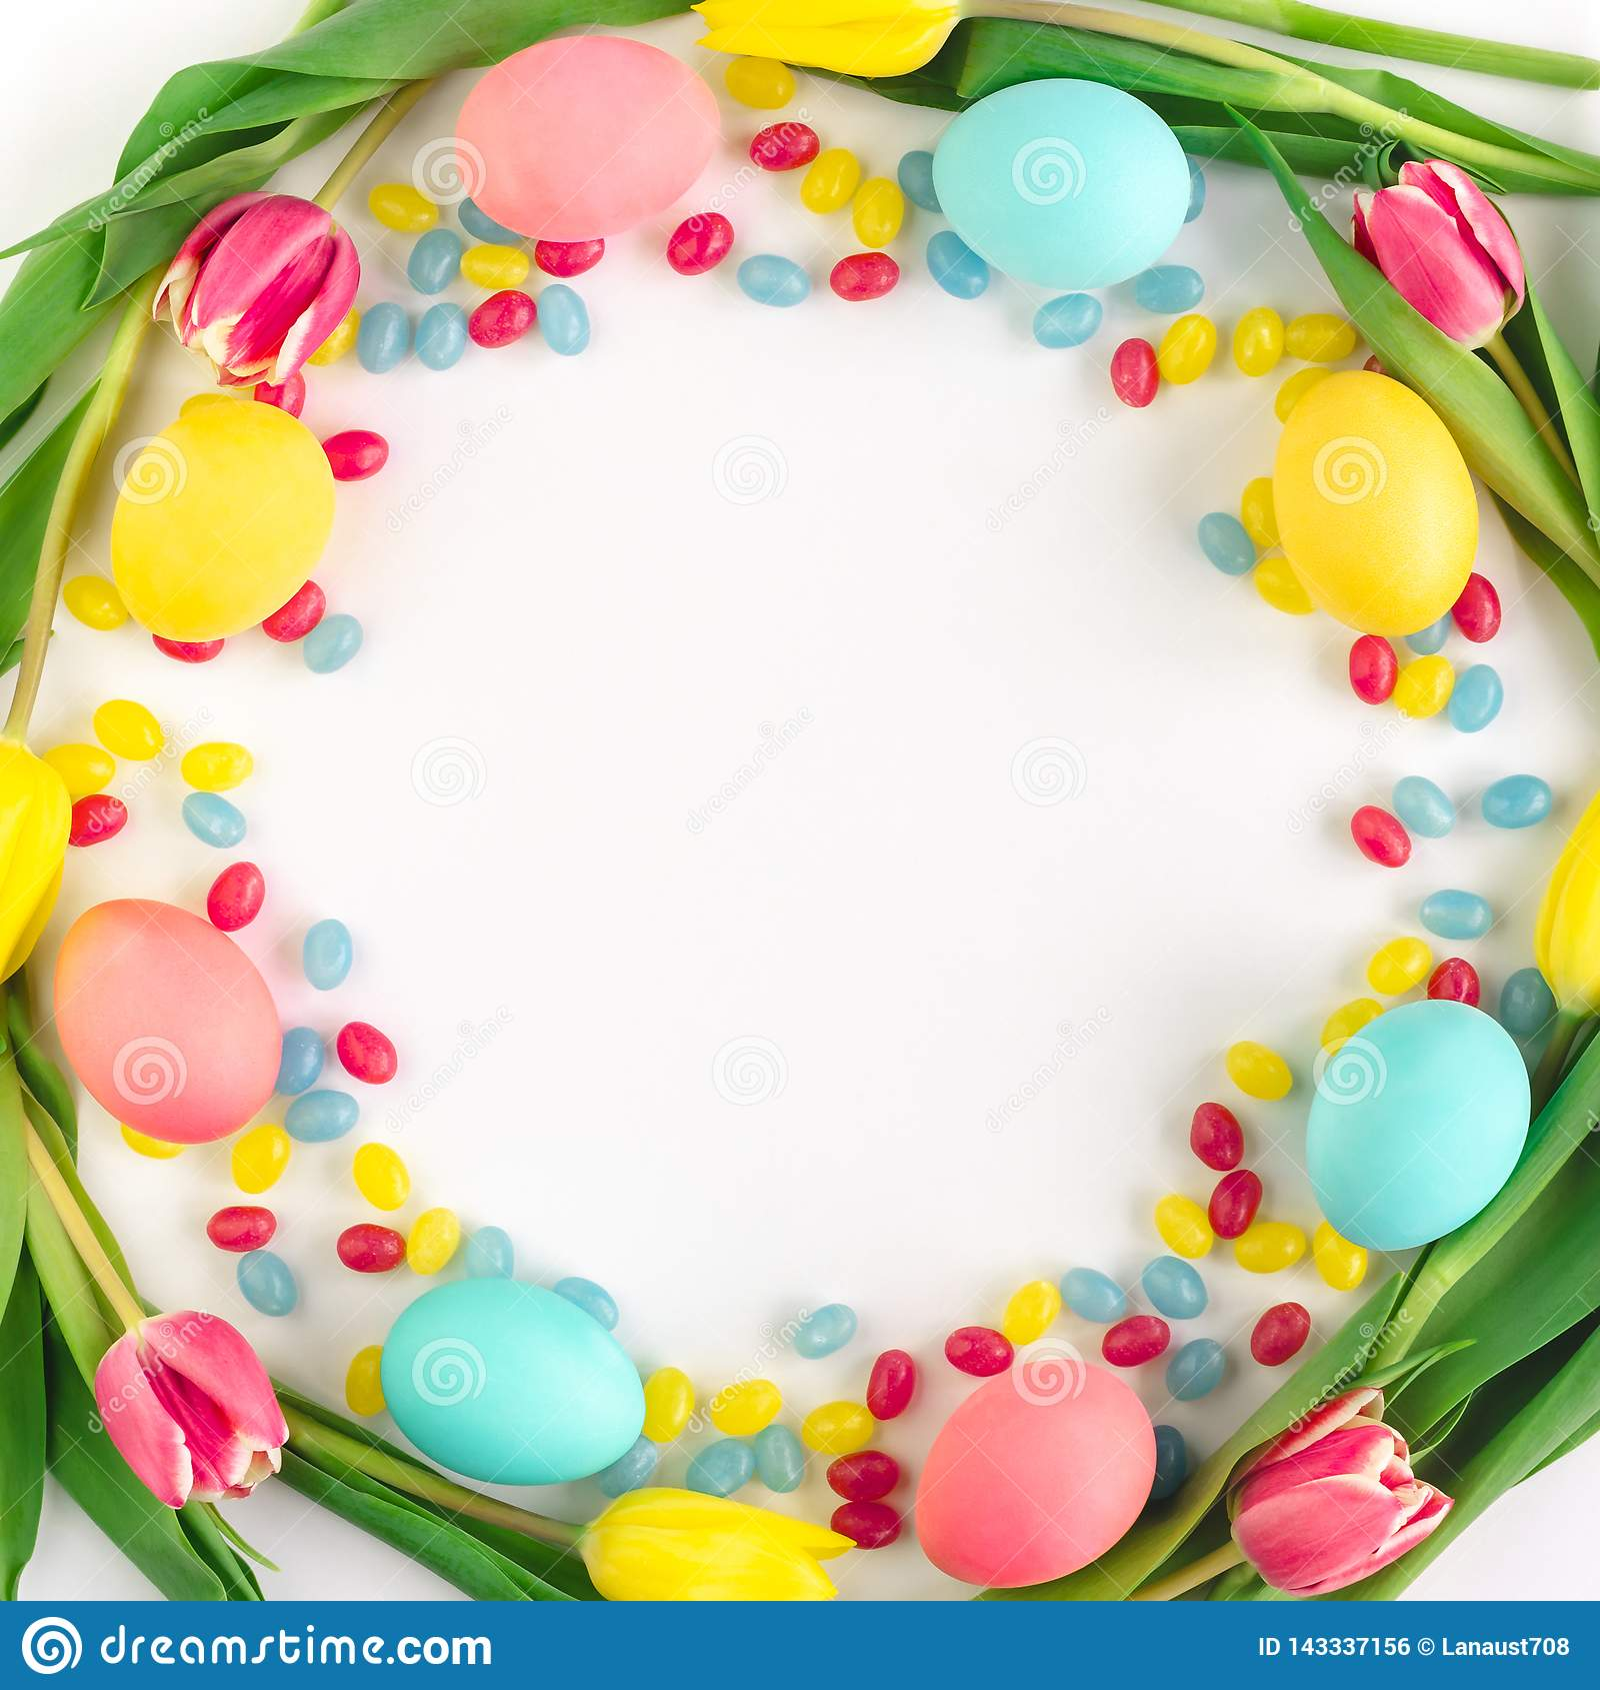 Grinalda da P?scoa feita de tulipas amarelas, de ovos coloridos e de doces no fundo branco Configura??o lisa